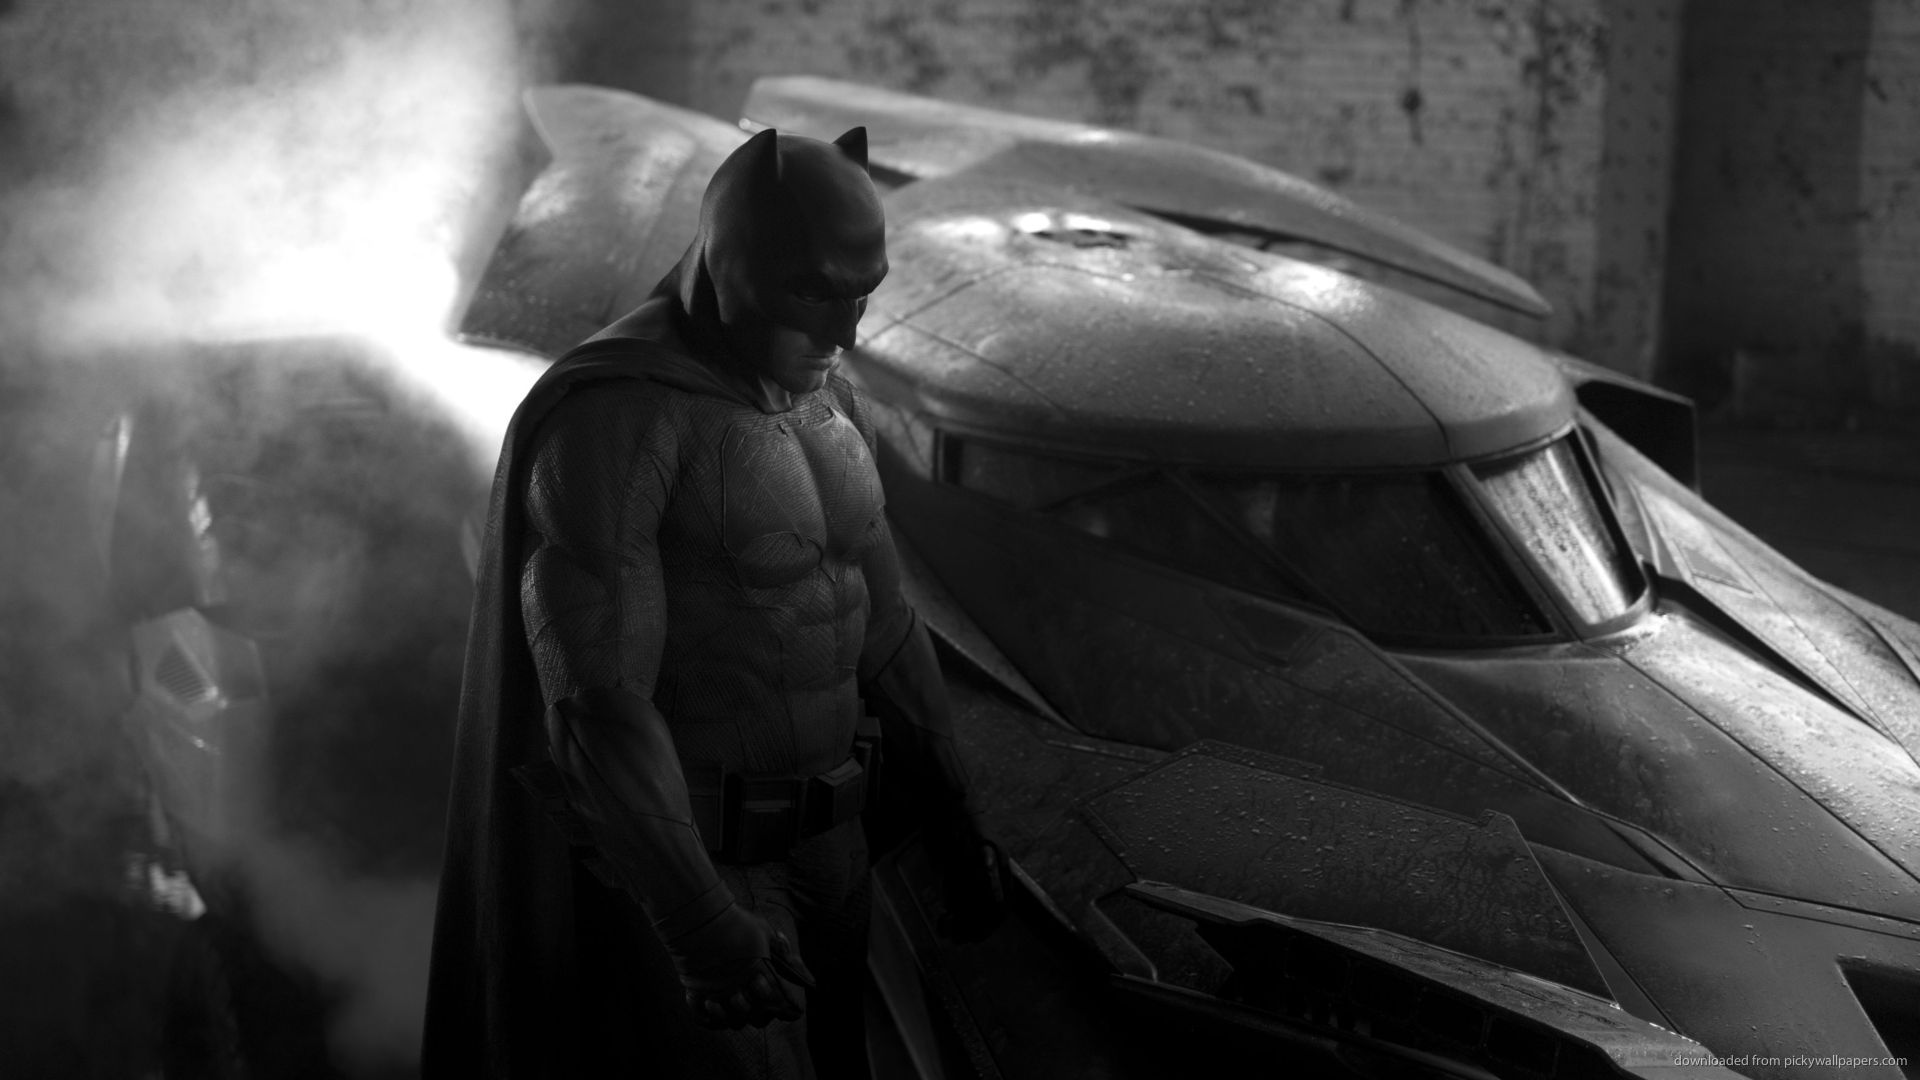 22 batman wallpapers hd - the nology